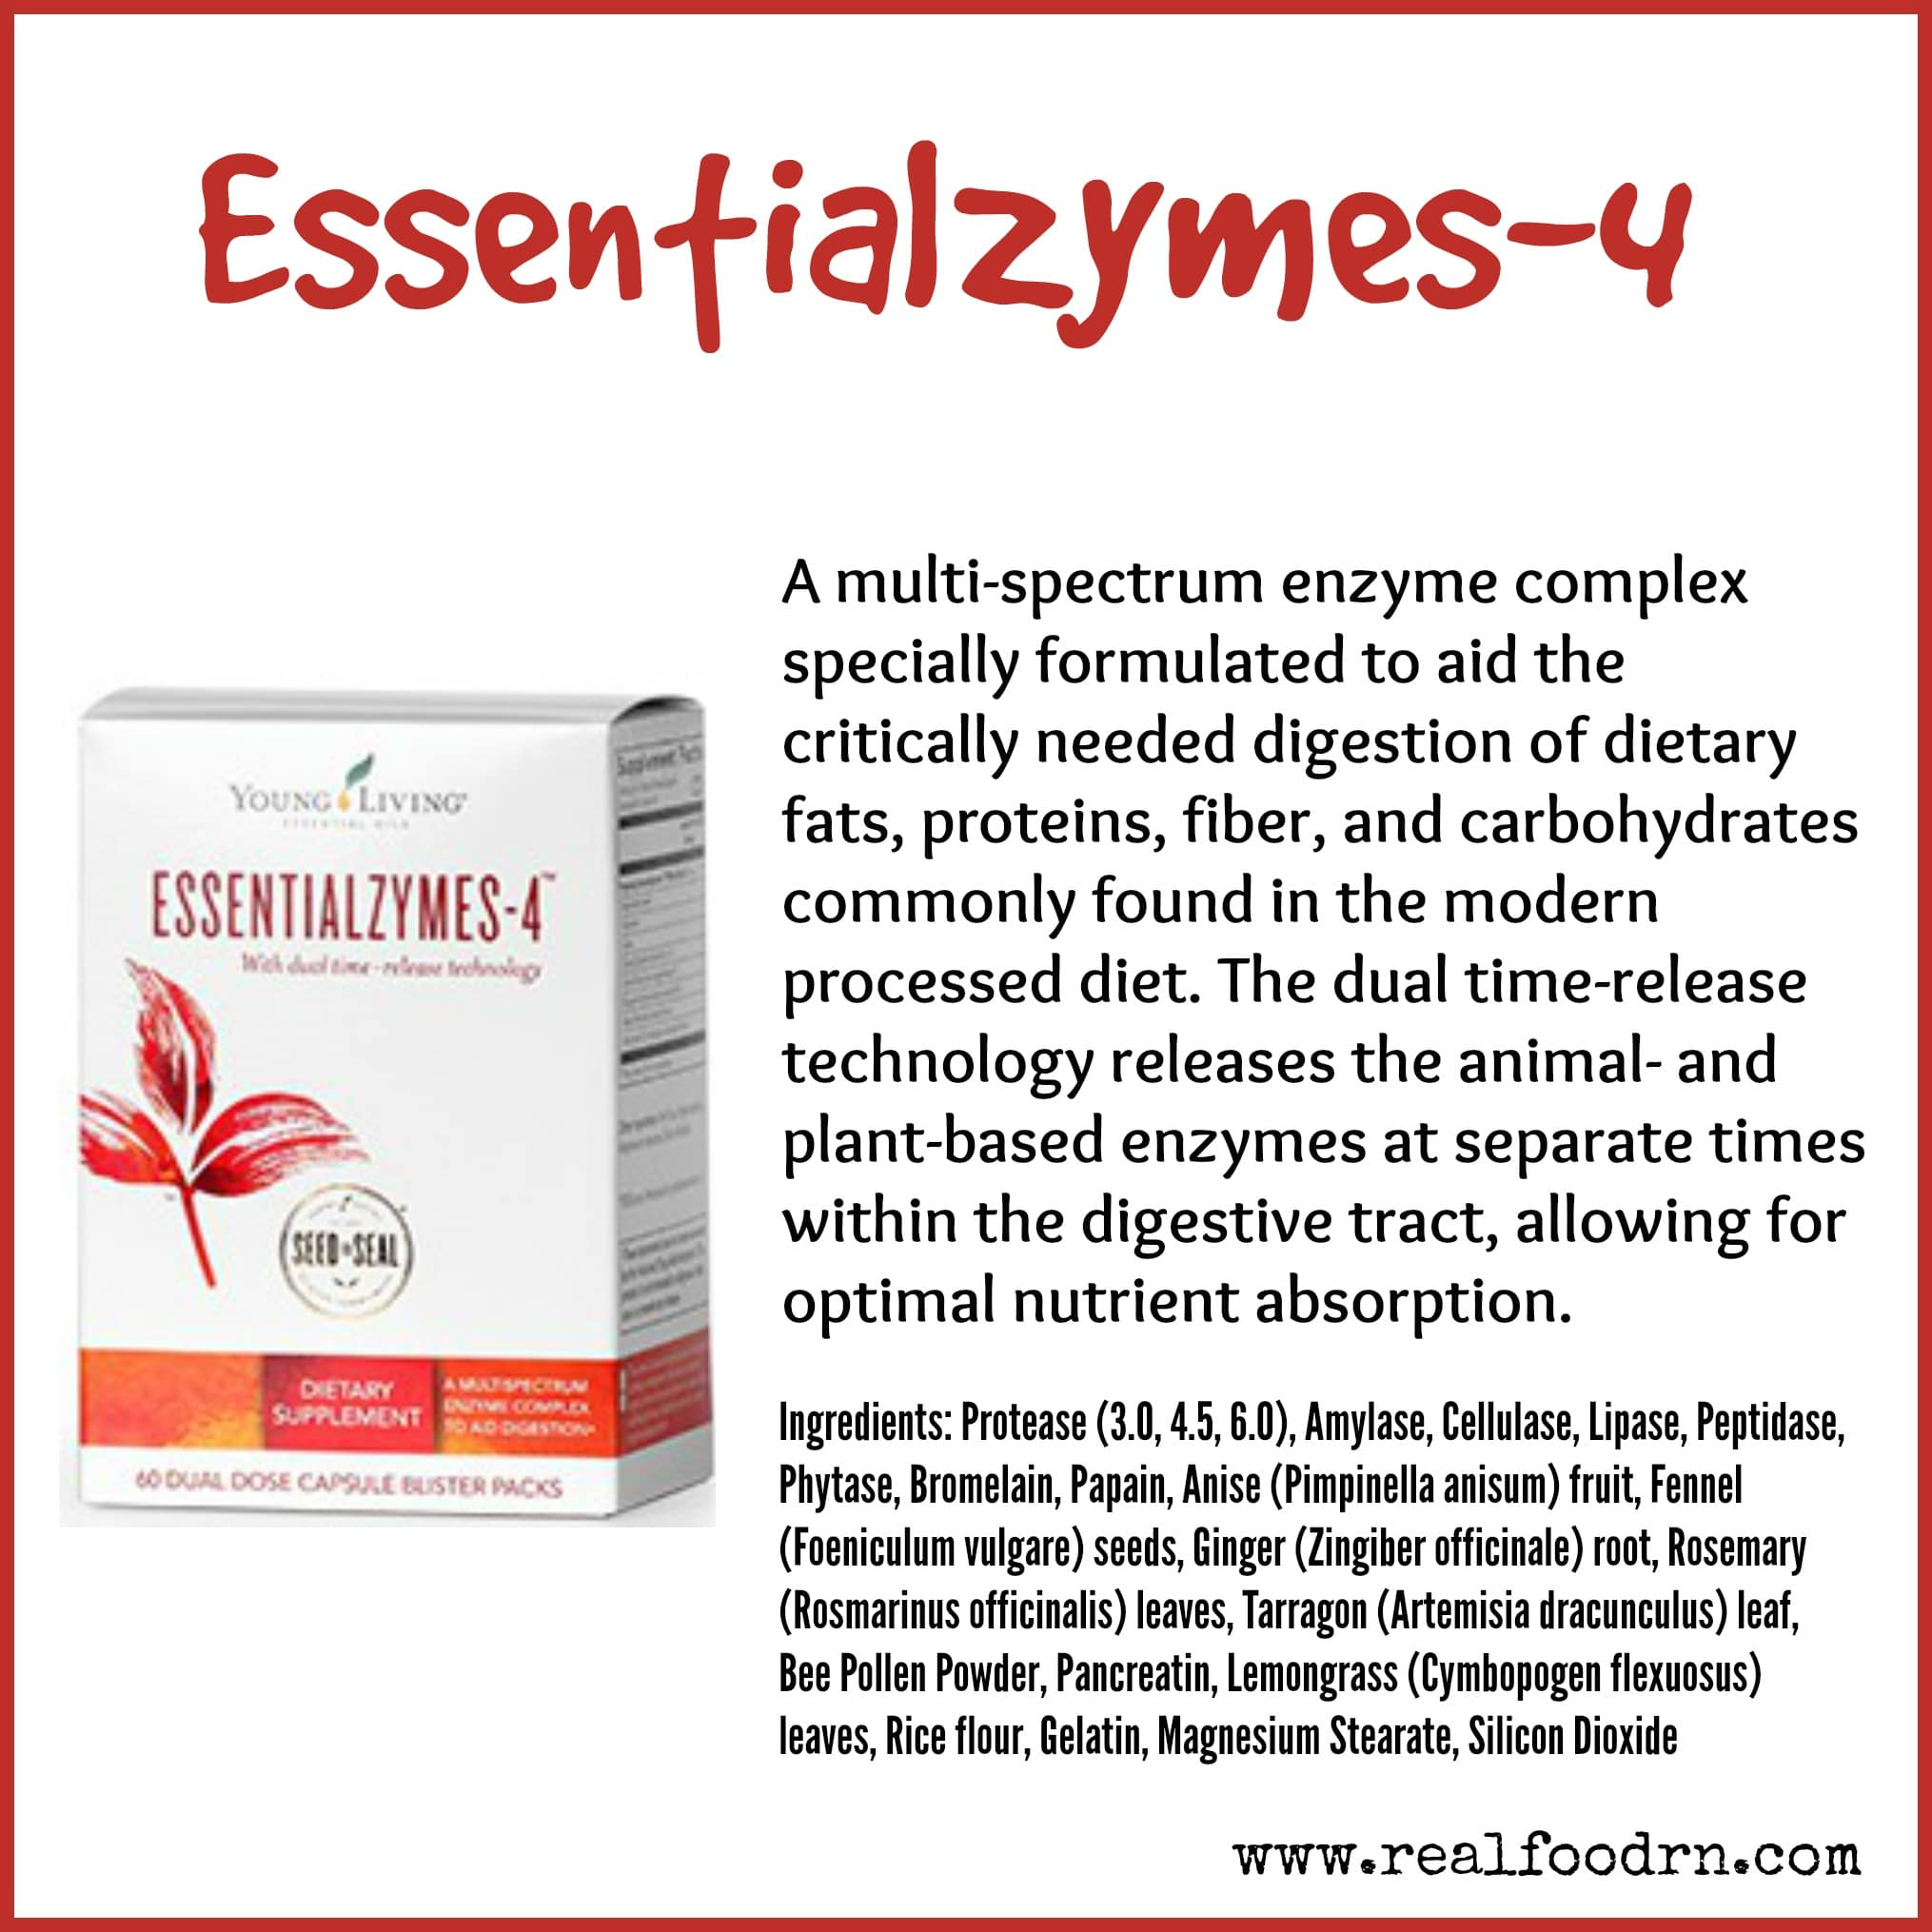 Essentialzymes 4